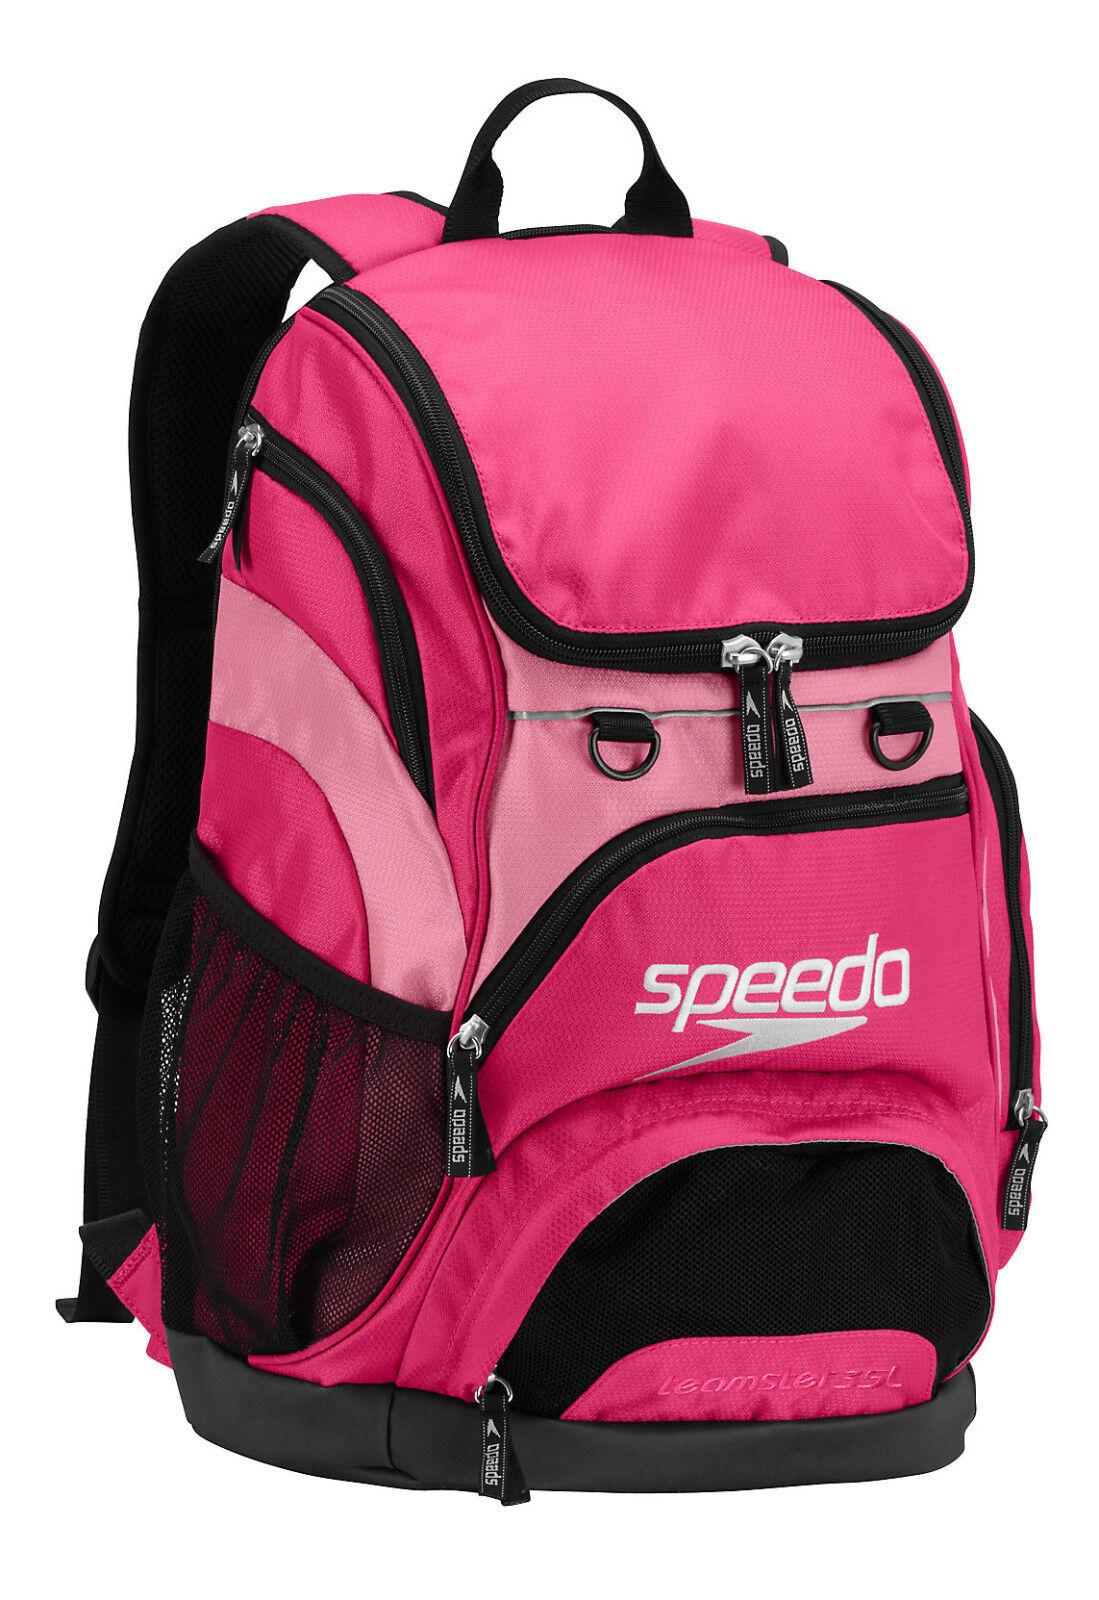 Speedo Large Teamster Backpack Swim Bag 35 L Liter AZALEA